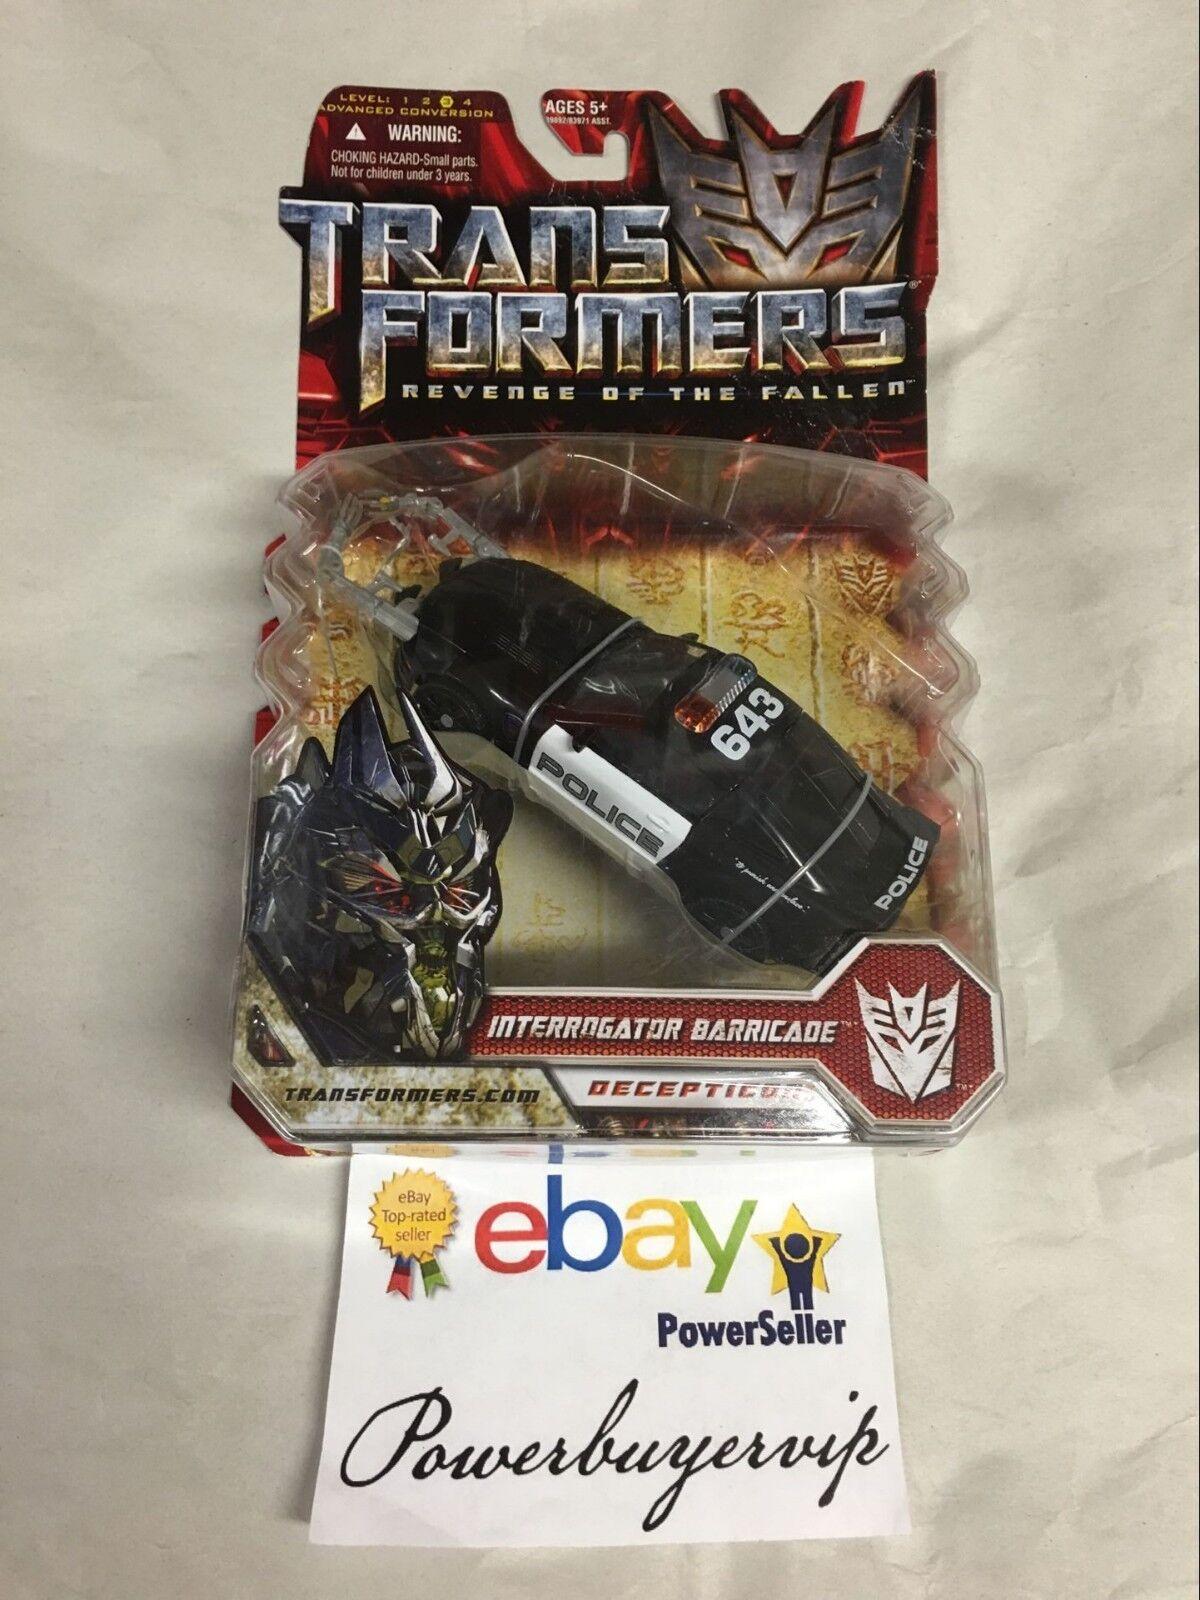 NEW Hasbro Transformers Movie 2 Premium Deluxe Interrogator Barricade 2 DAY GET